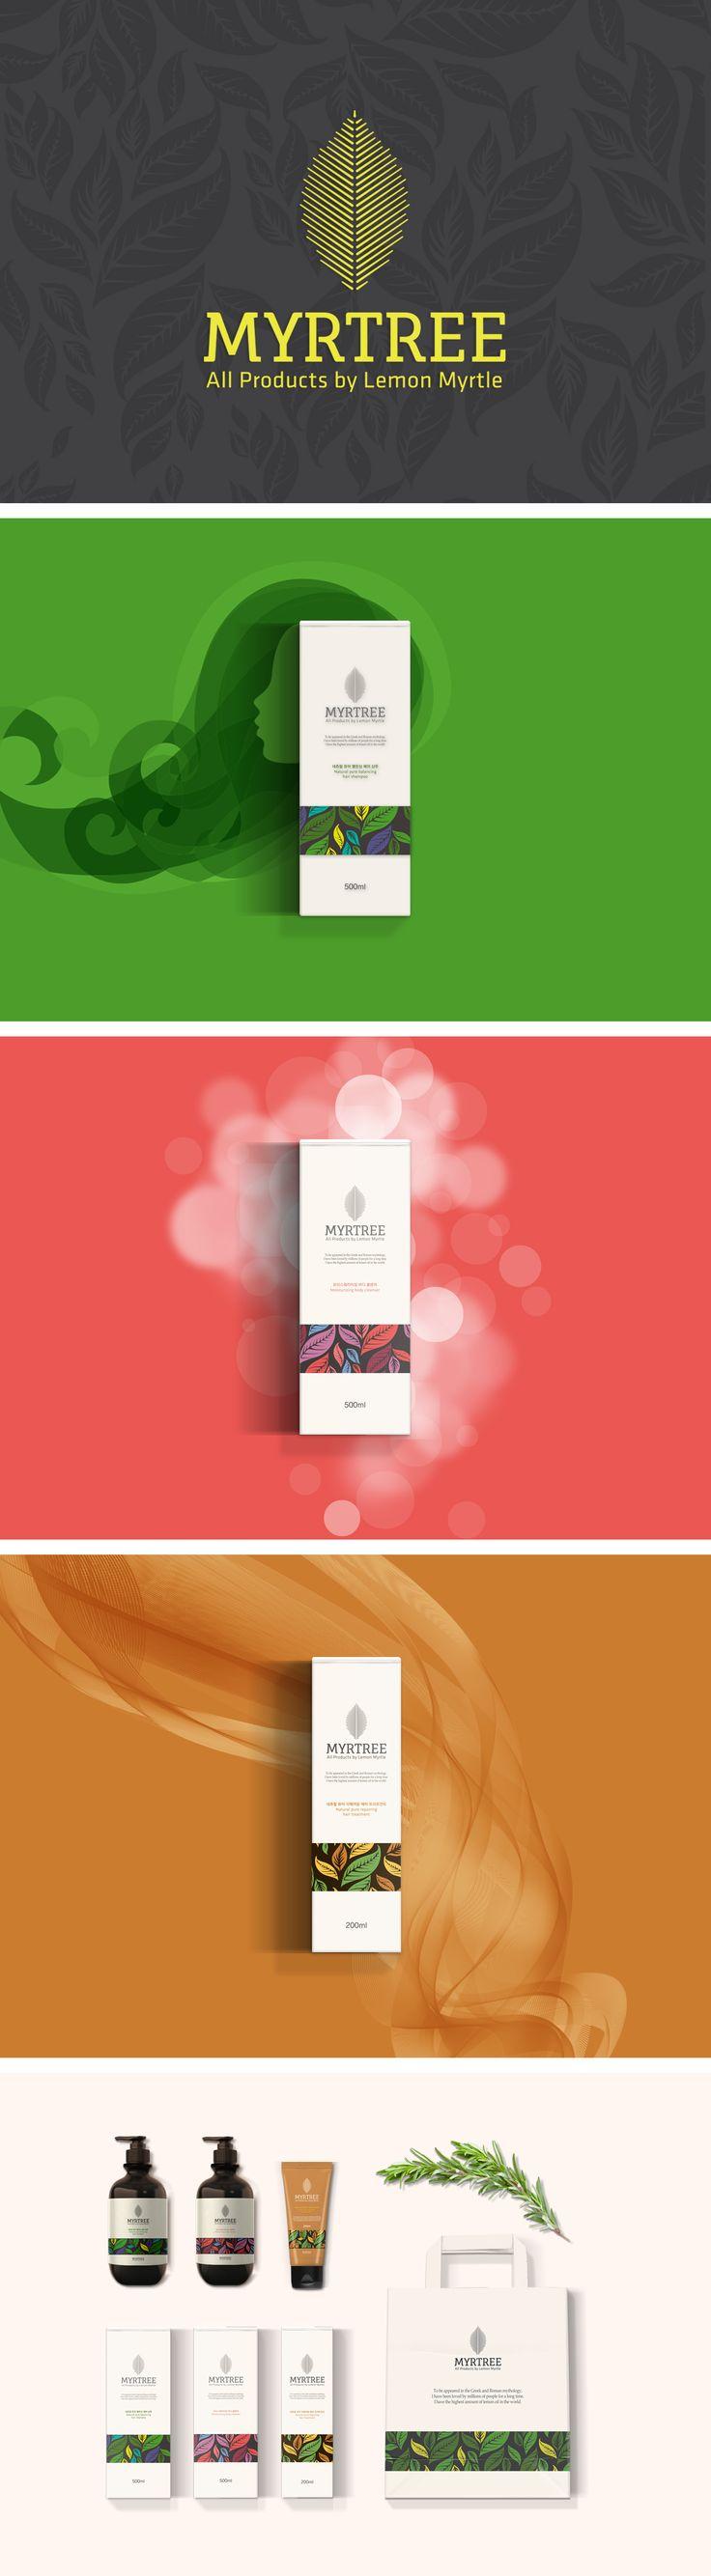 Myrtree / make Myrtle tea, shampoo, perfume / Package Design